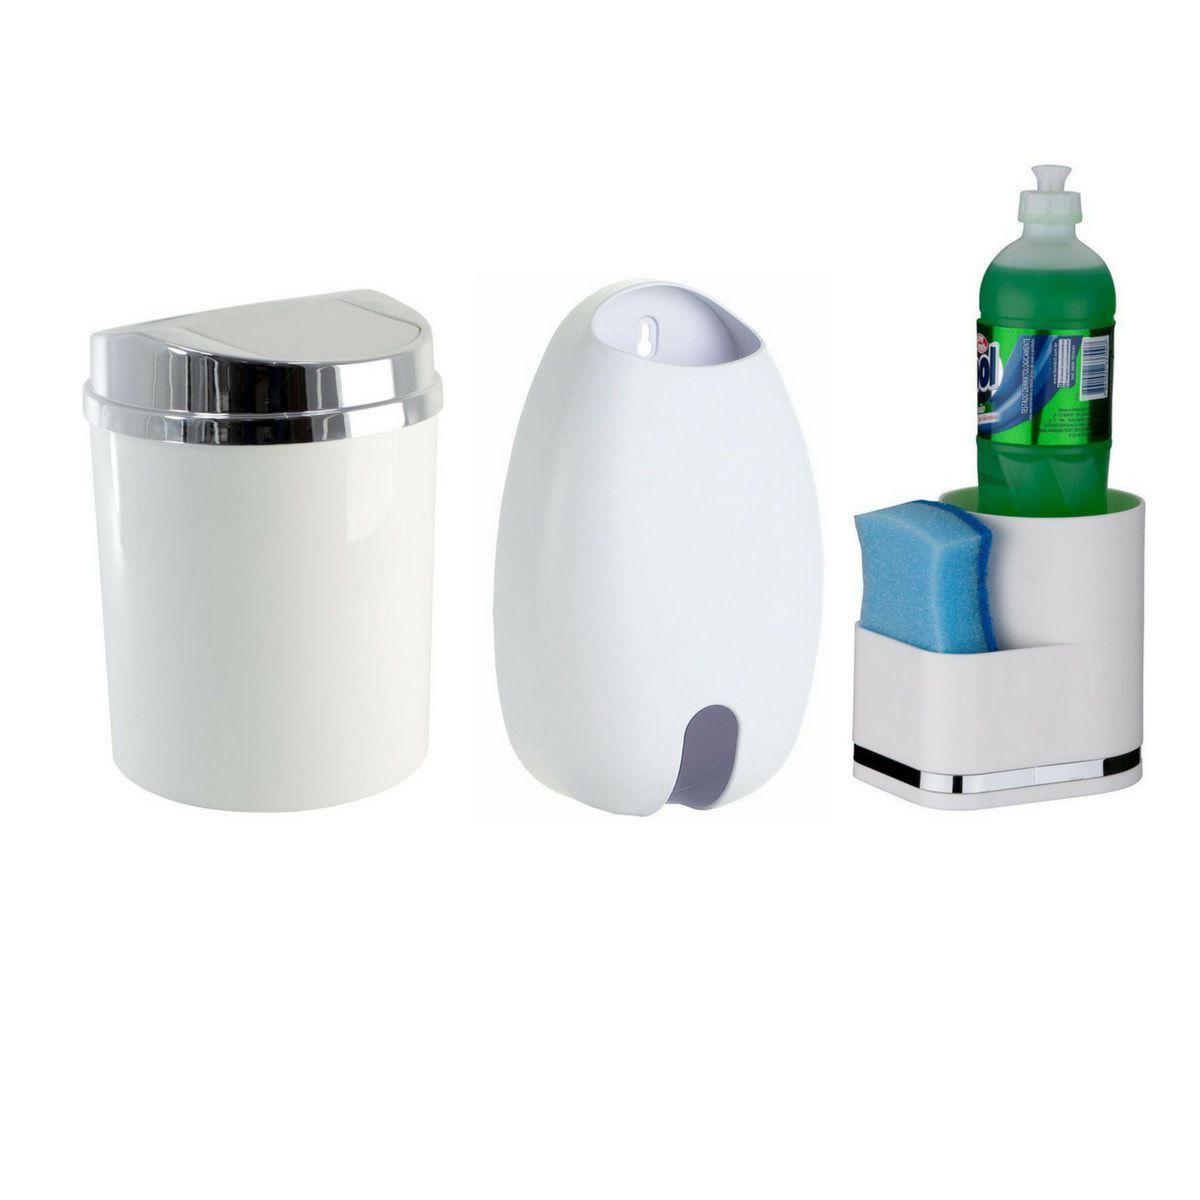 Kit lixeira basculaste + suporte detergente+  suporte sacolas